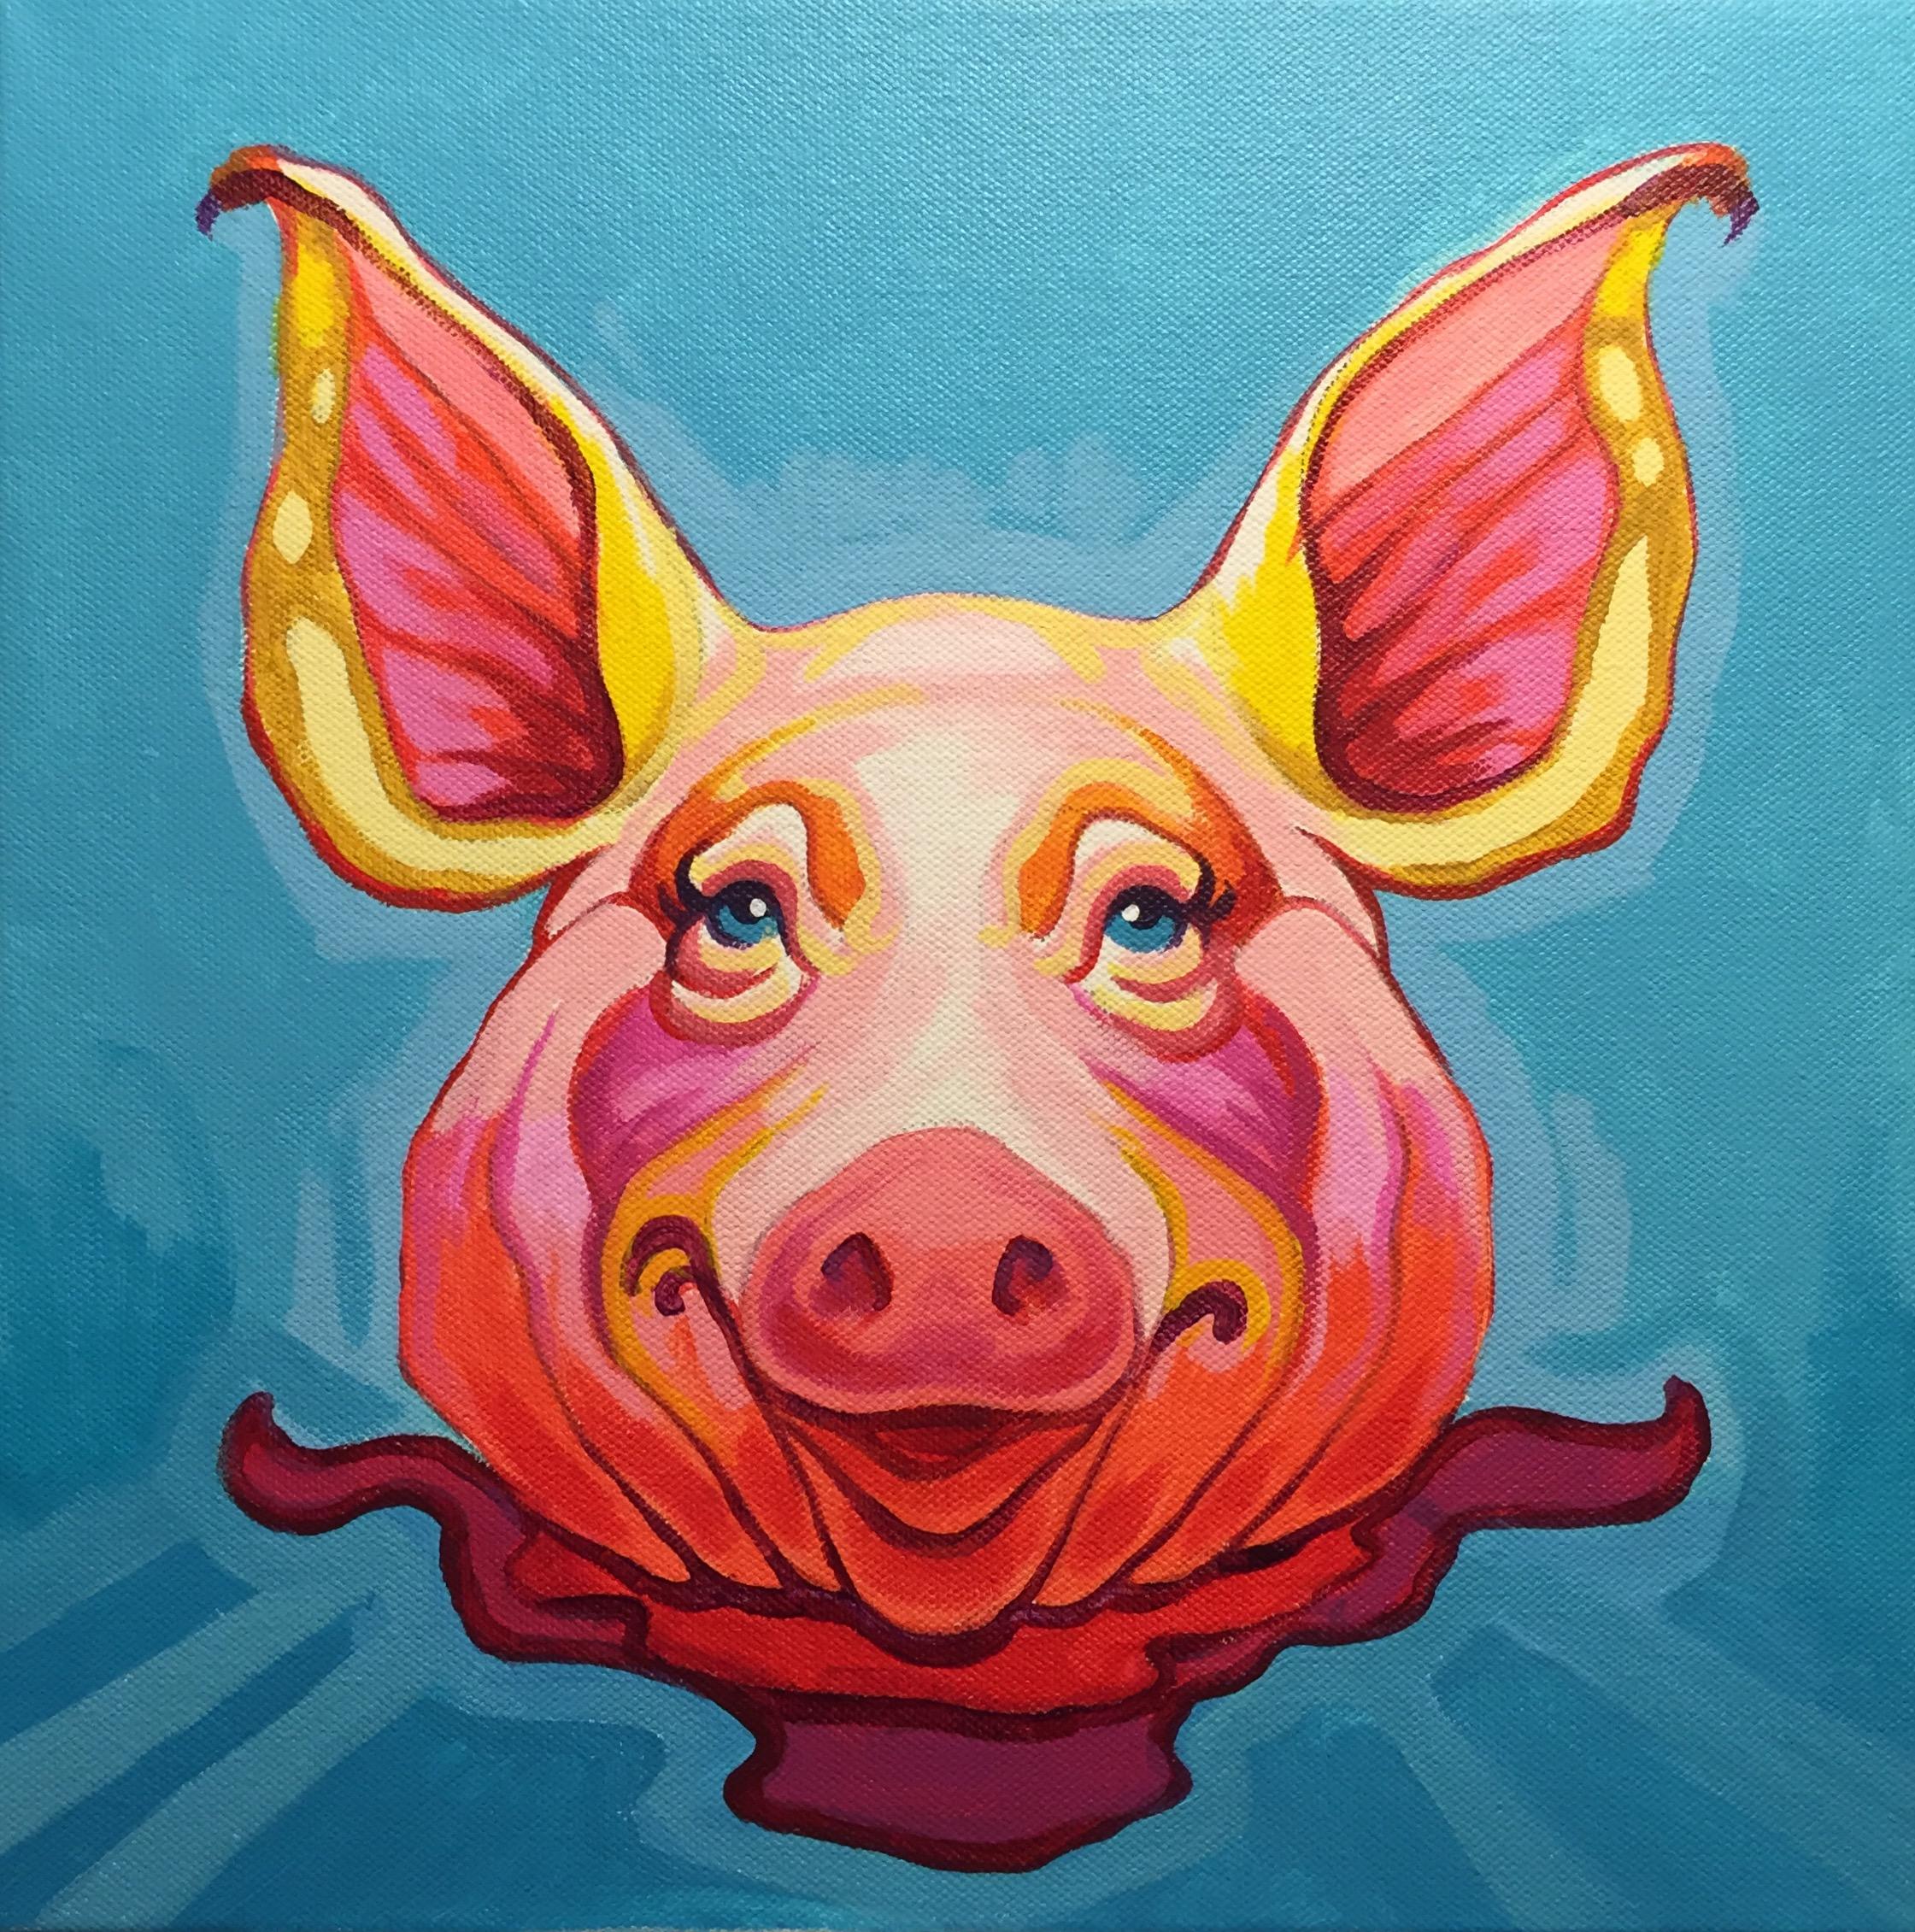 Marilyn - Three Little Pigs I